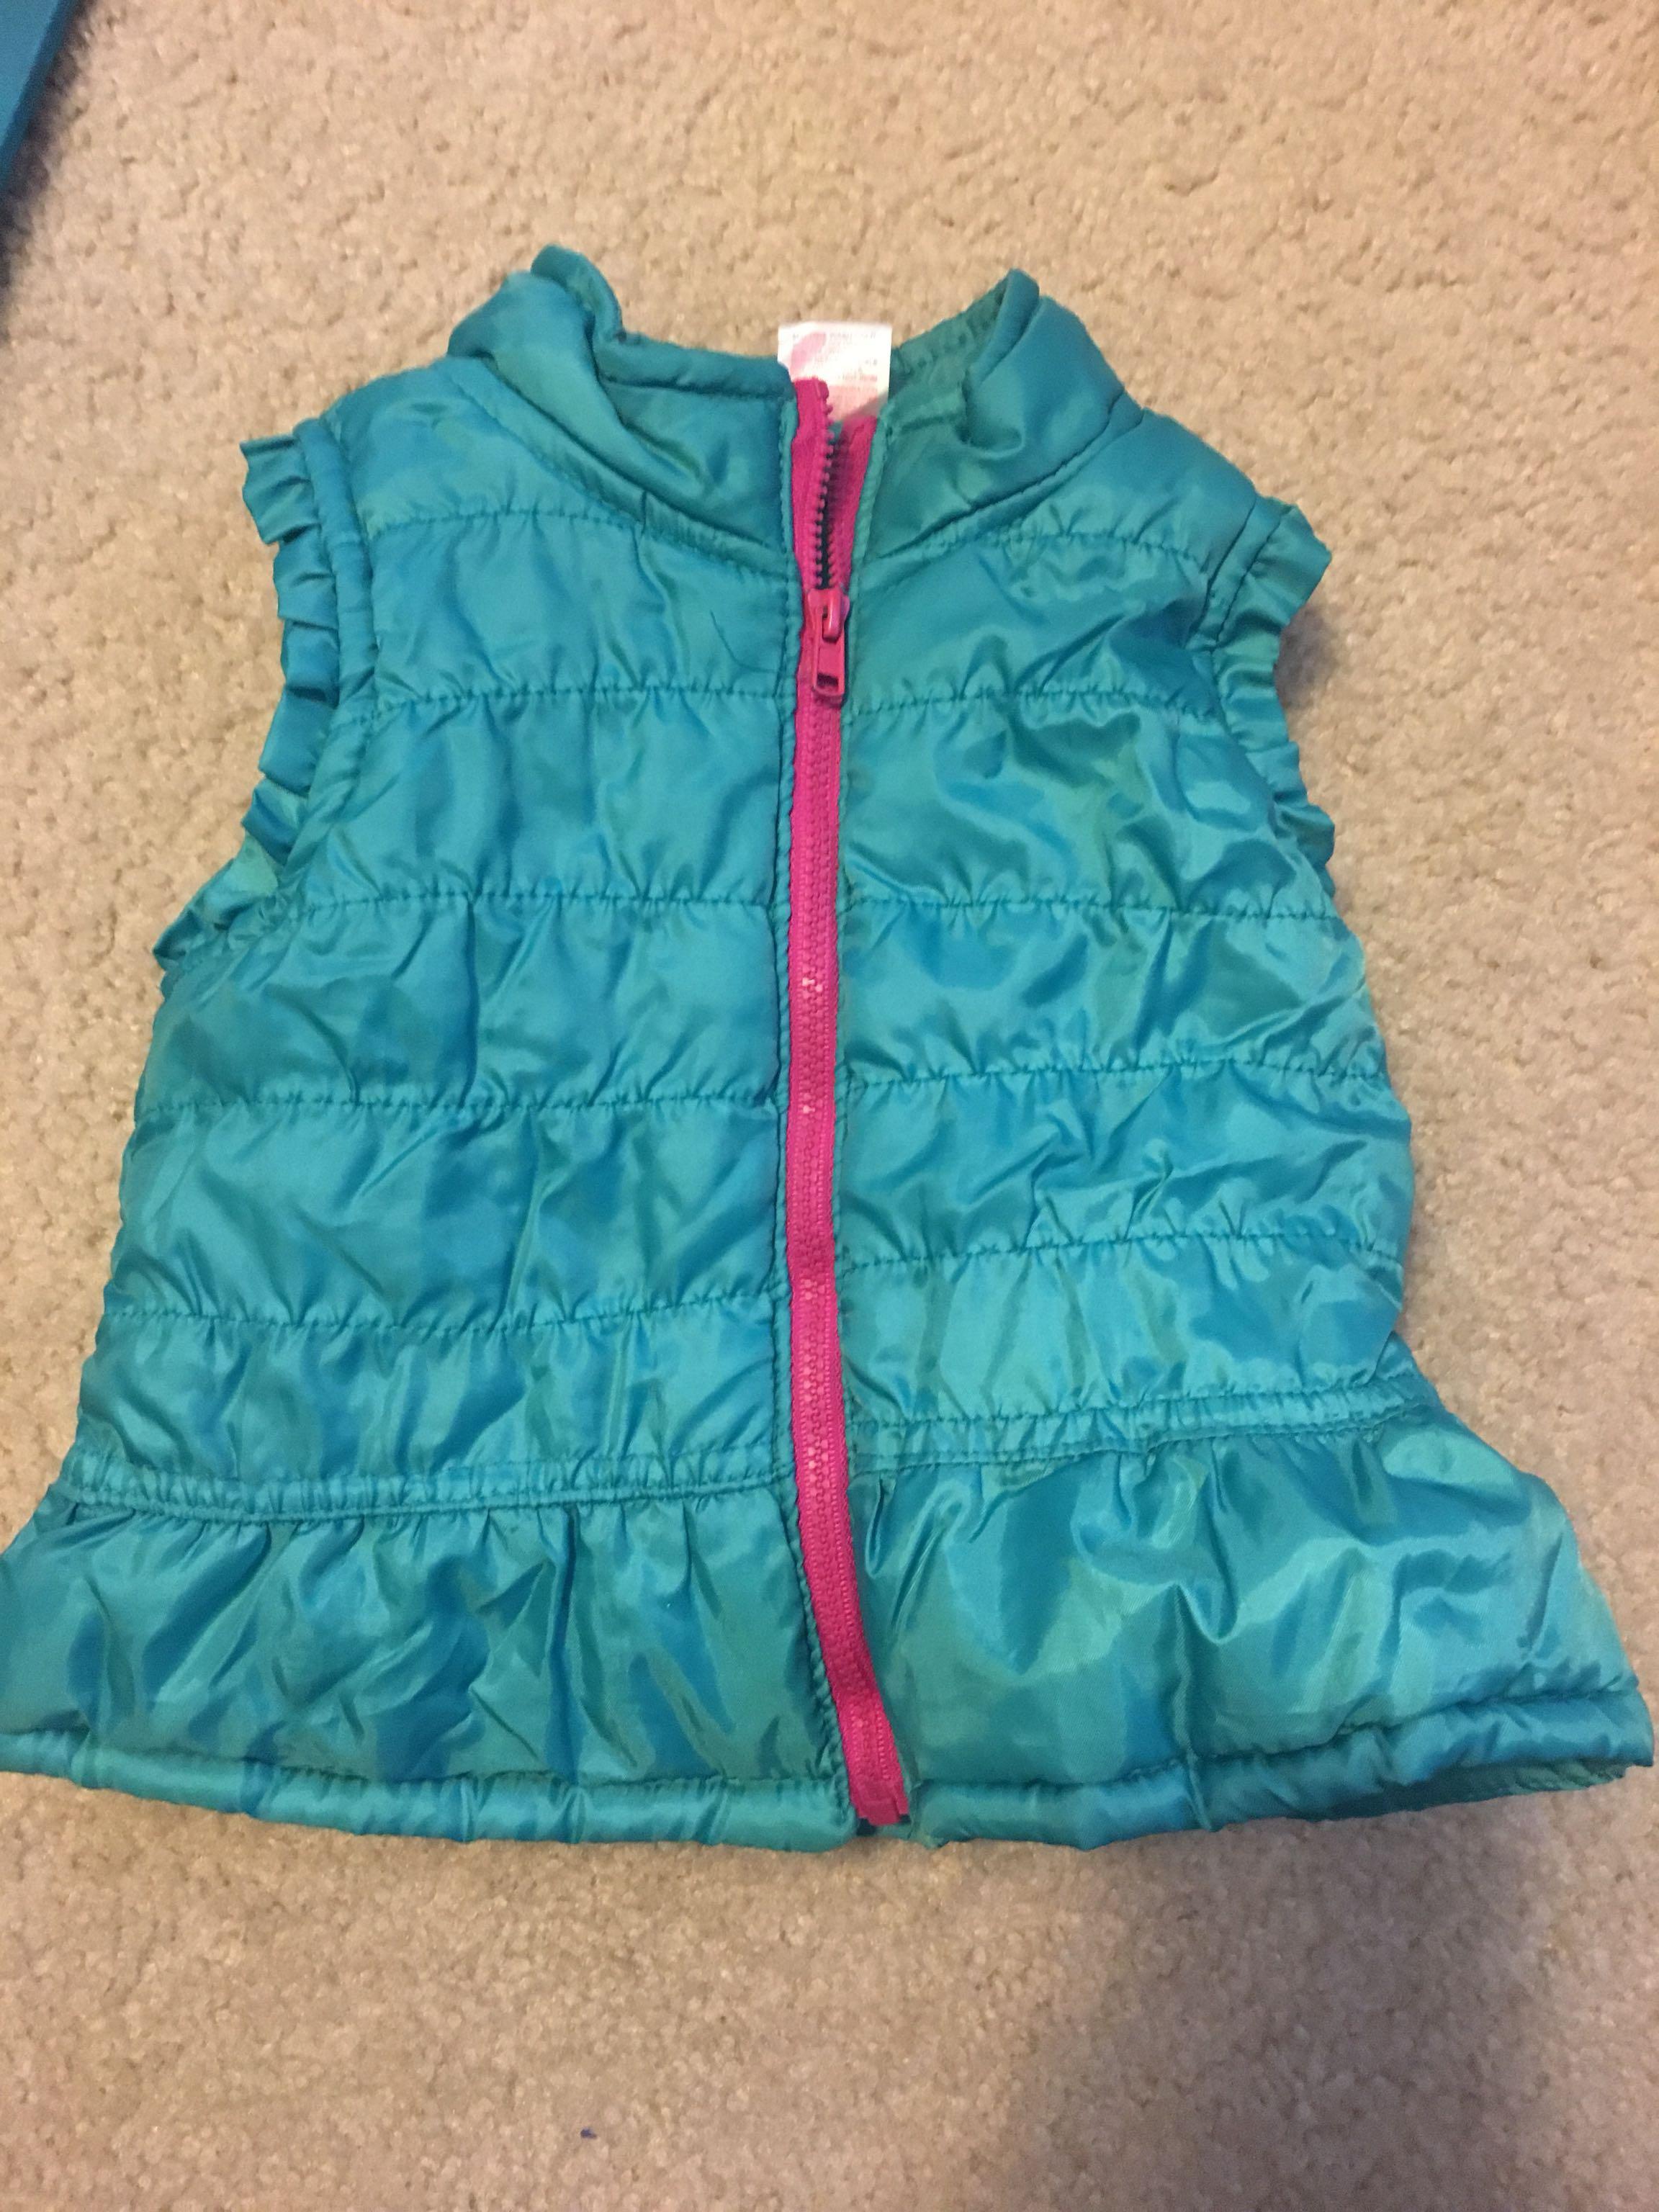 12 mo puffer vest